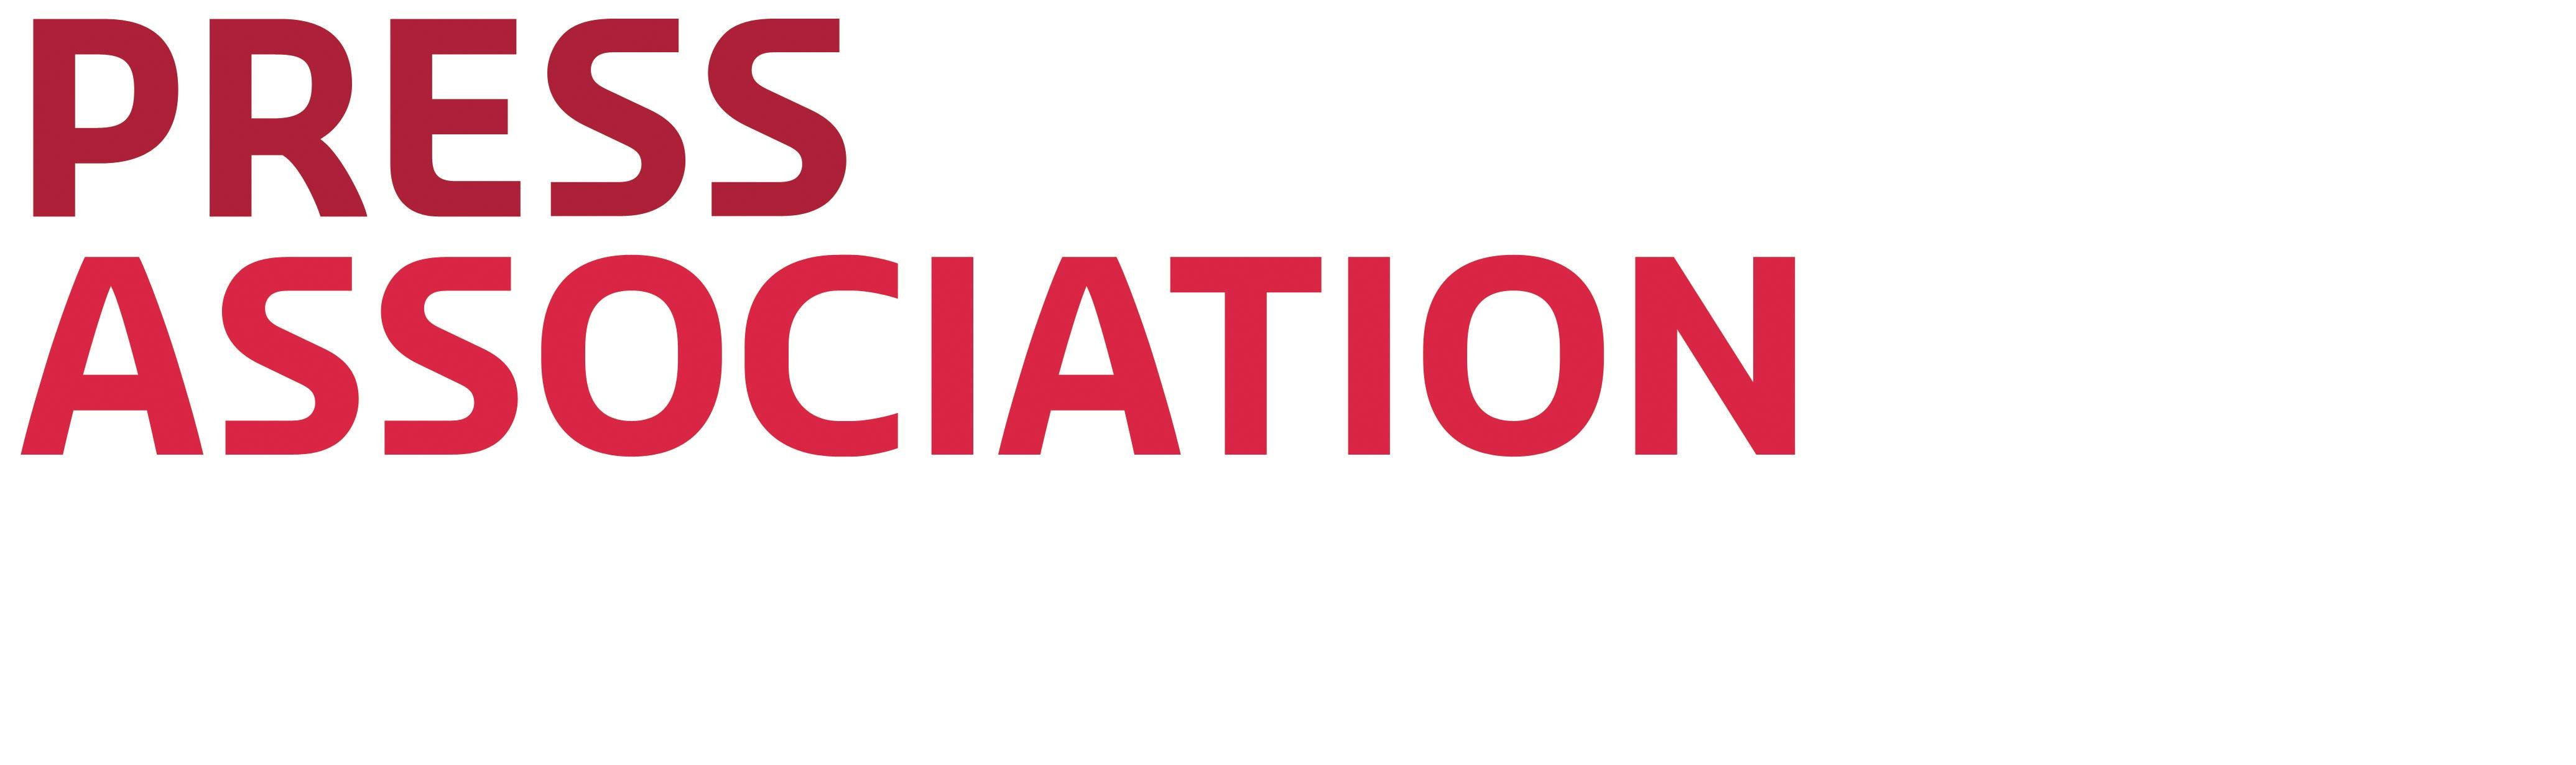 Press Association logo